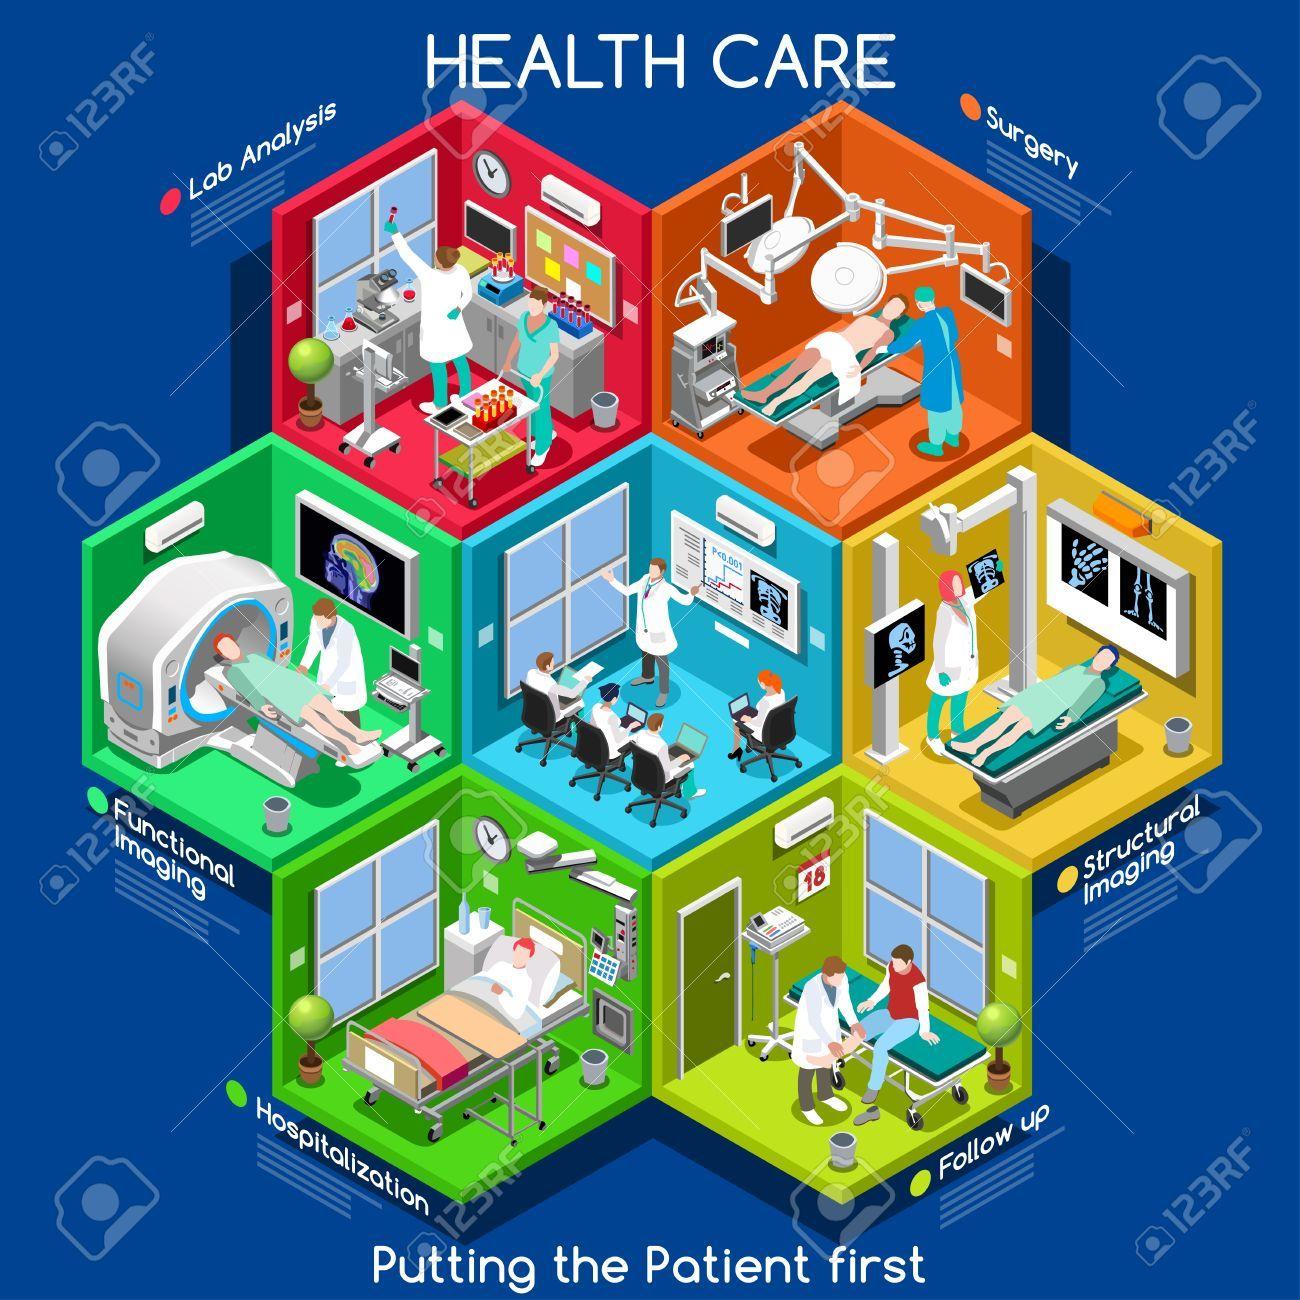 healthcare furniture diagram - Google Search | Healthcare | Pinterest